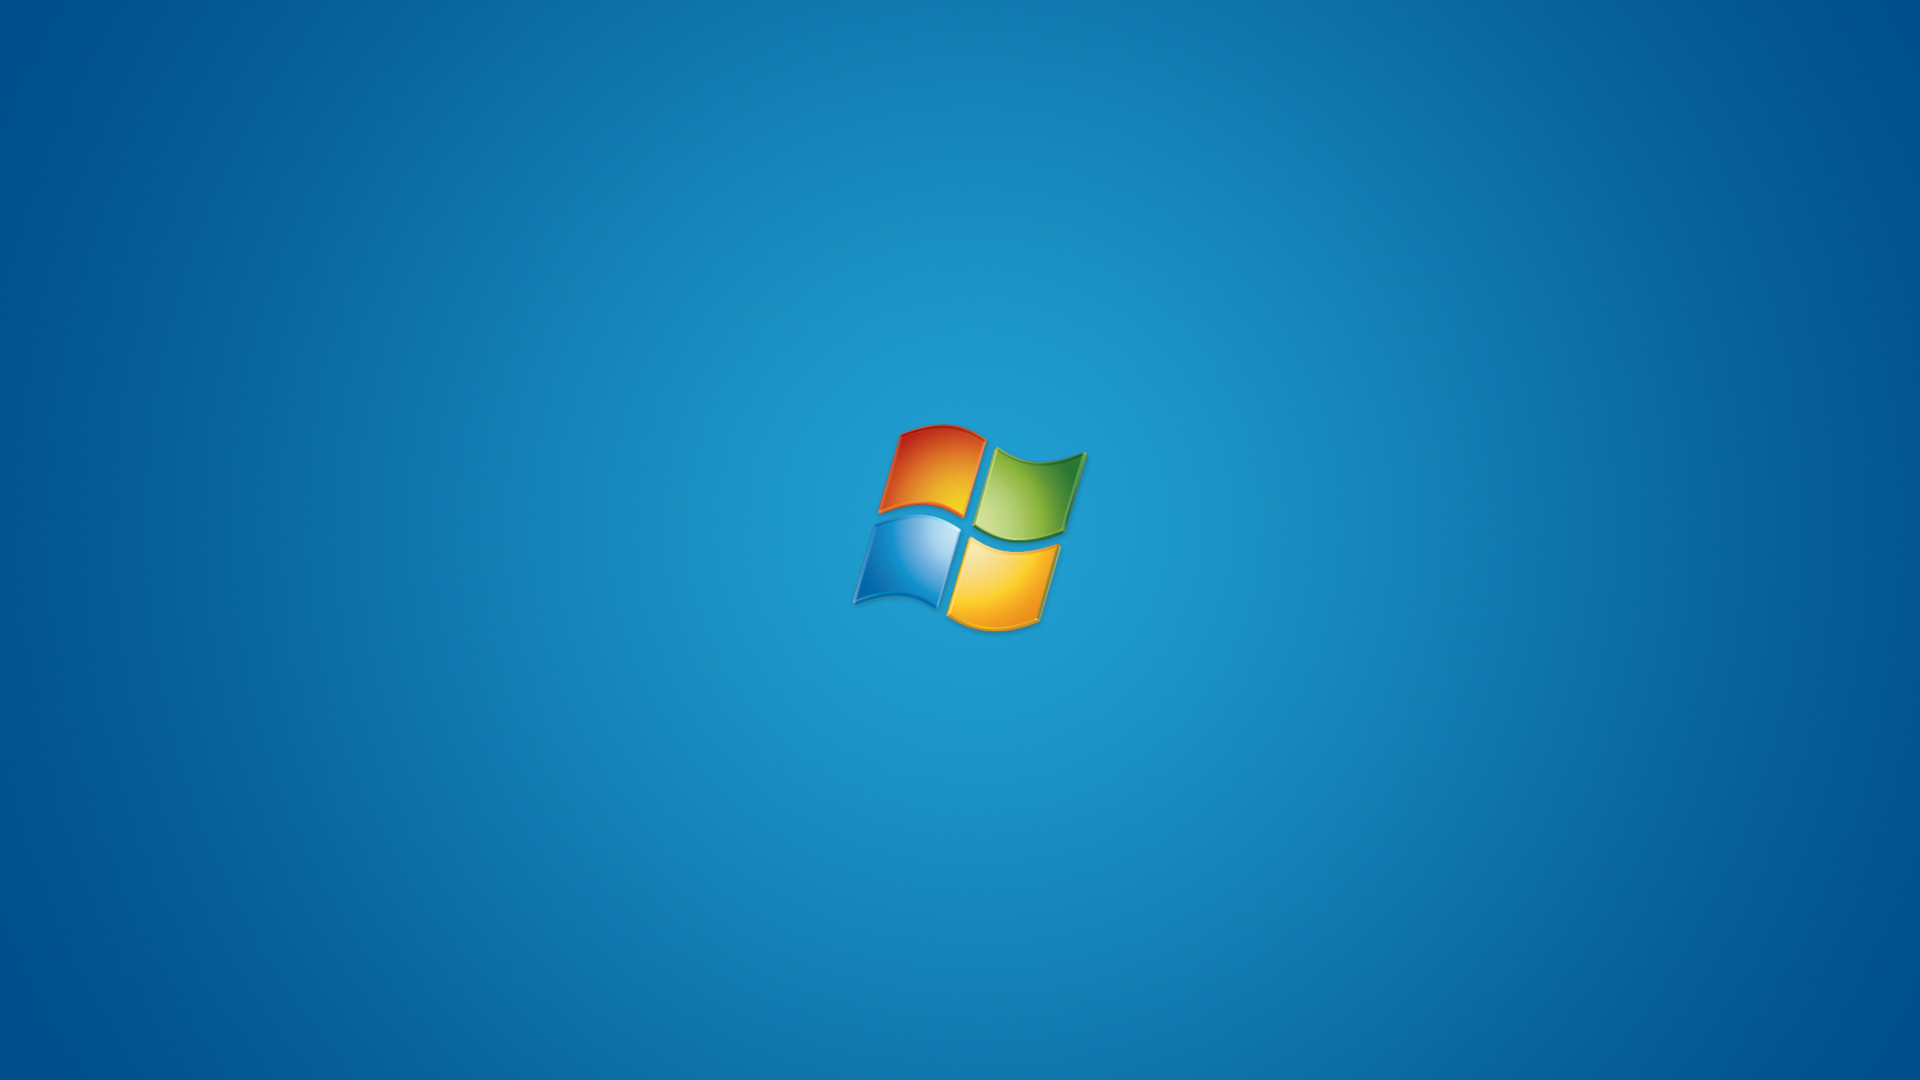 microsoft windows themes free